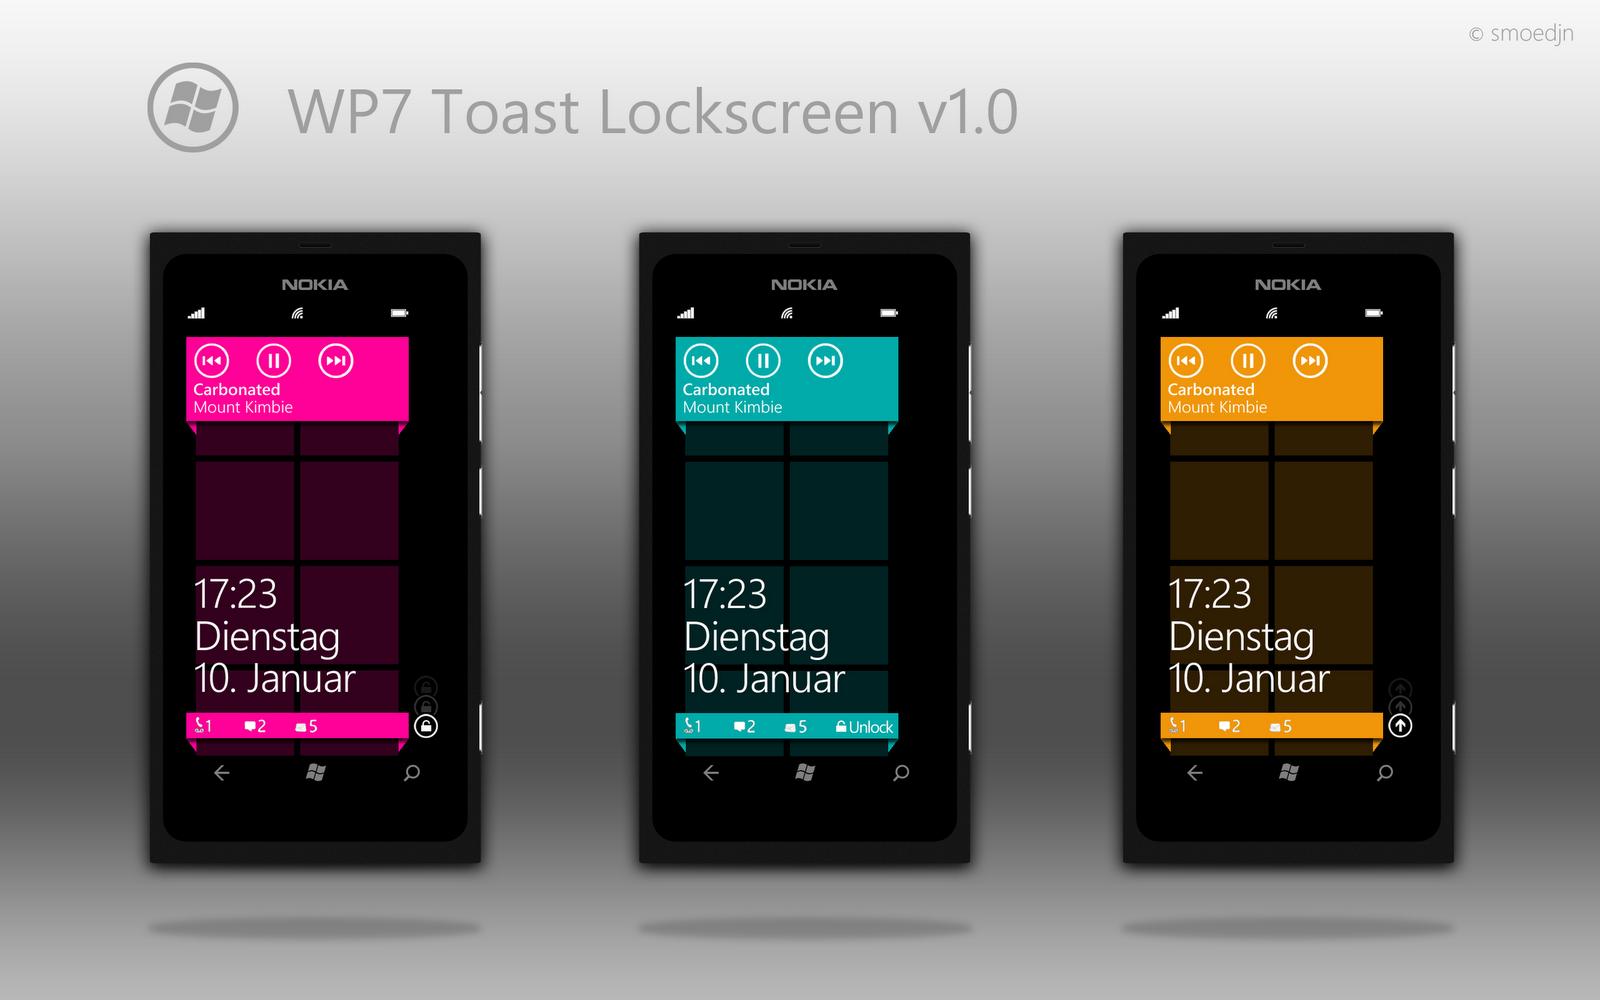 Windows phone wallpapers best windows phone 7 wallpapers - Explore Windows Phone 7 Best Windows And More